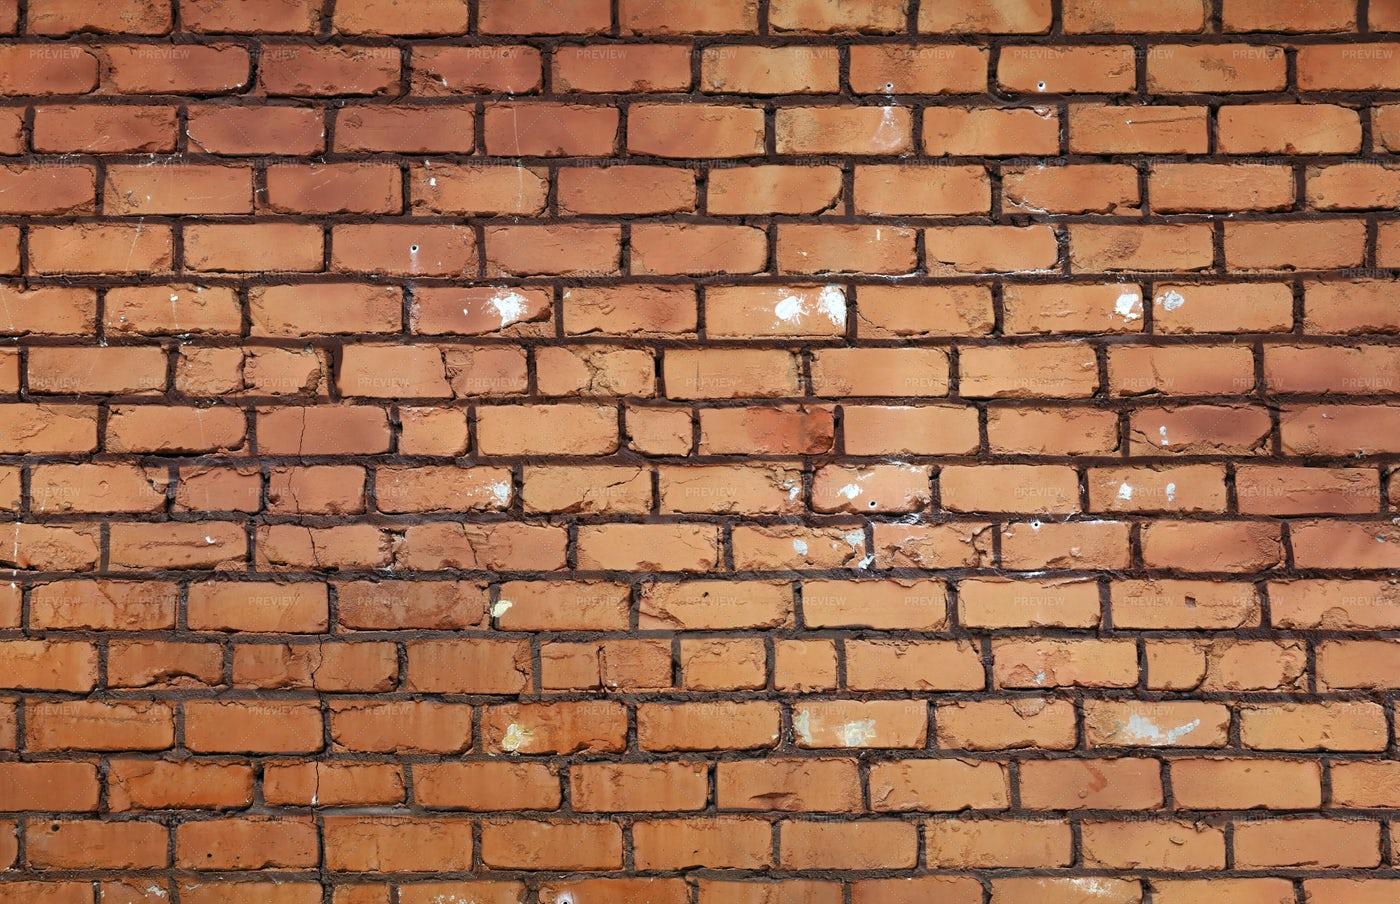 Rough Brown Brick Wall: Stock Photos